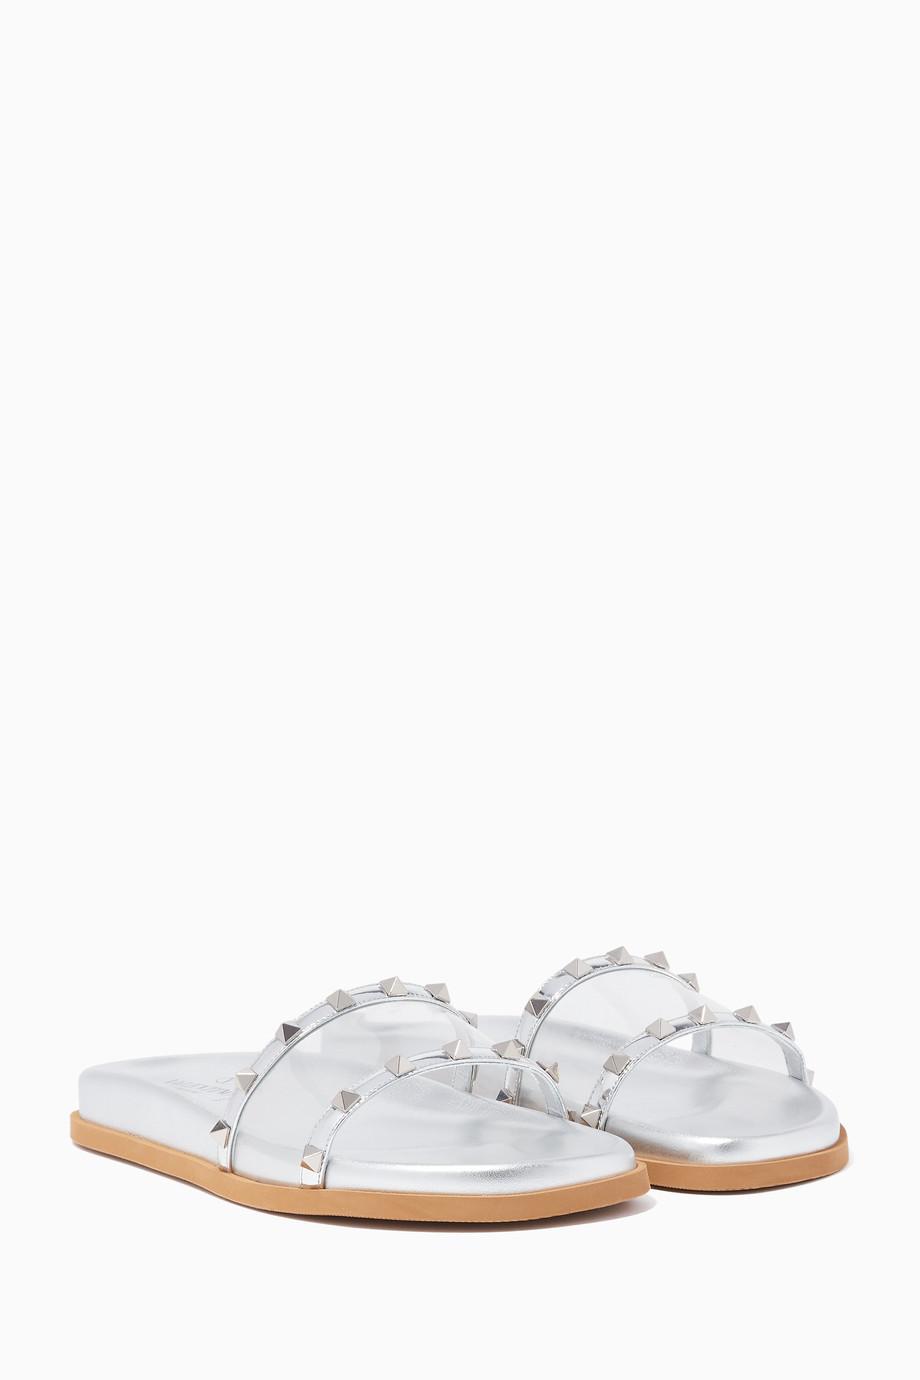 14d61e41313f Shop Valentino Silver Silver Moonwalk PVC Rockstud Slides for Women ...